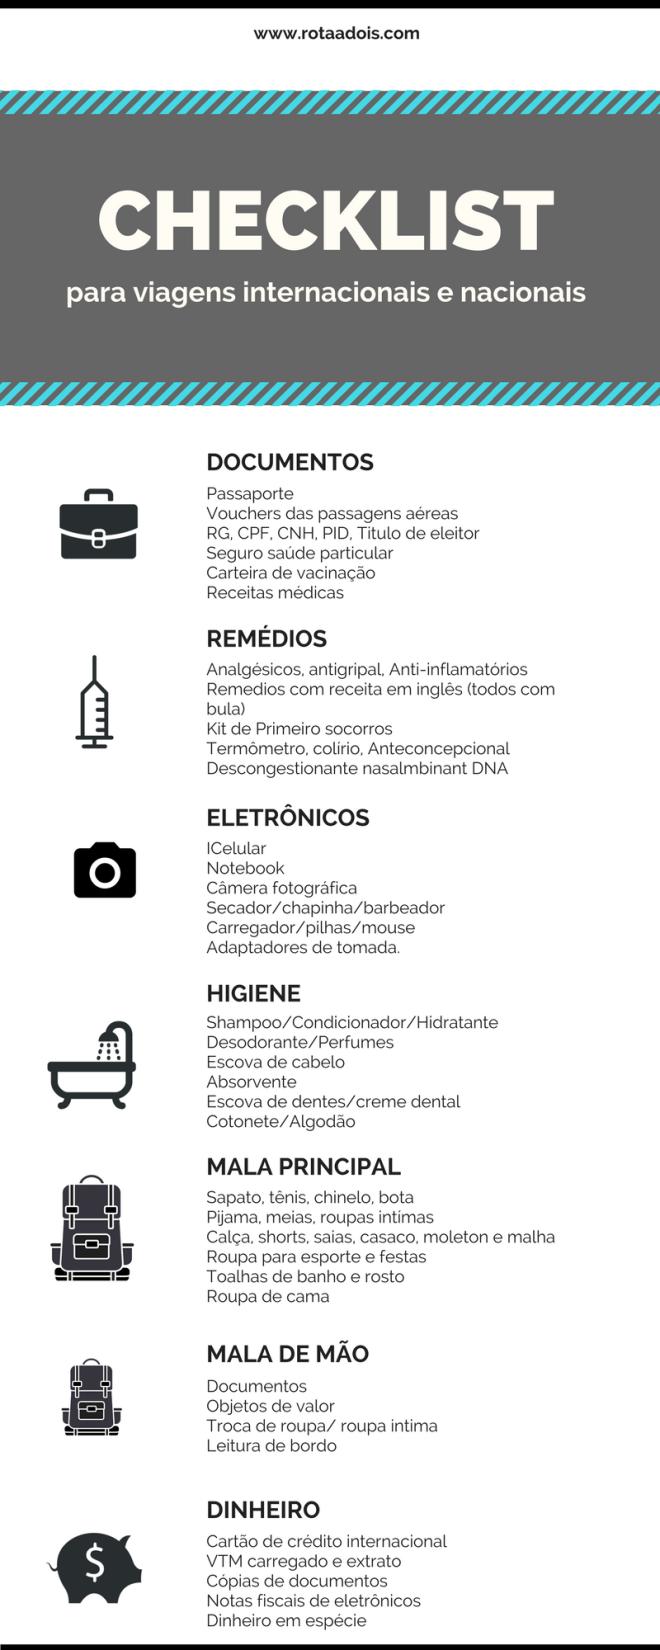 www.rotaadois.com (1)